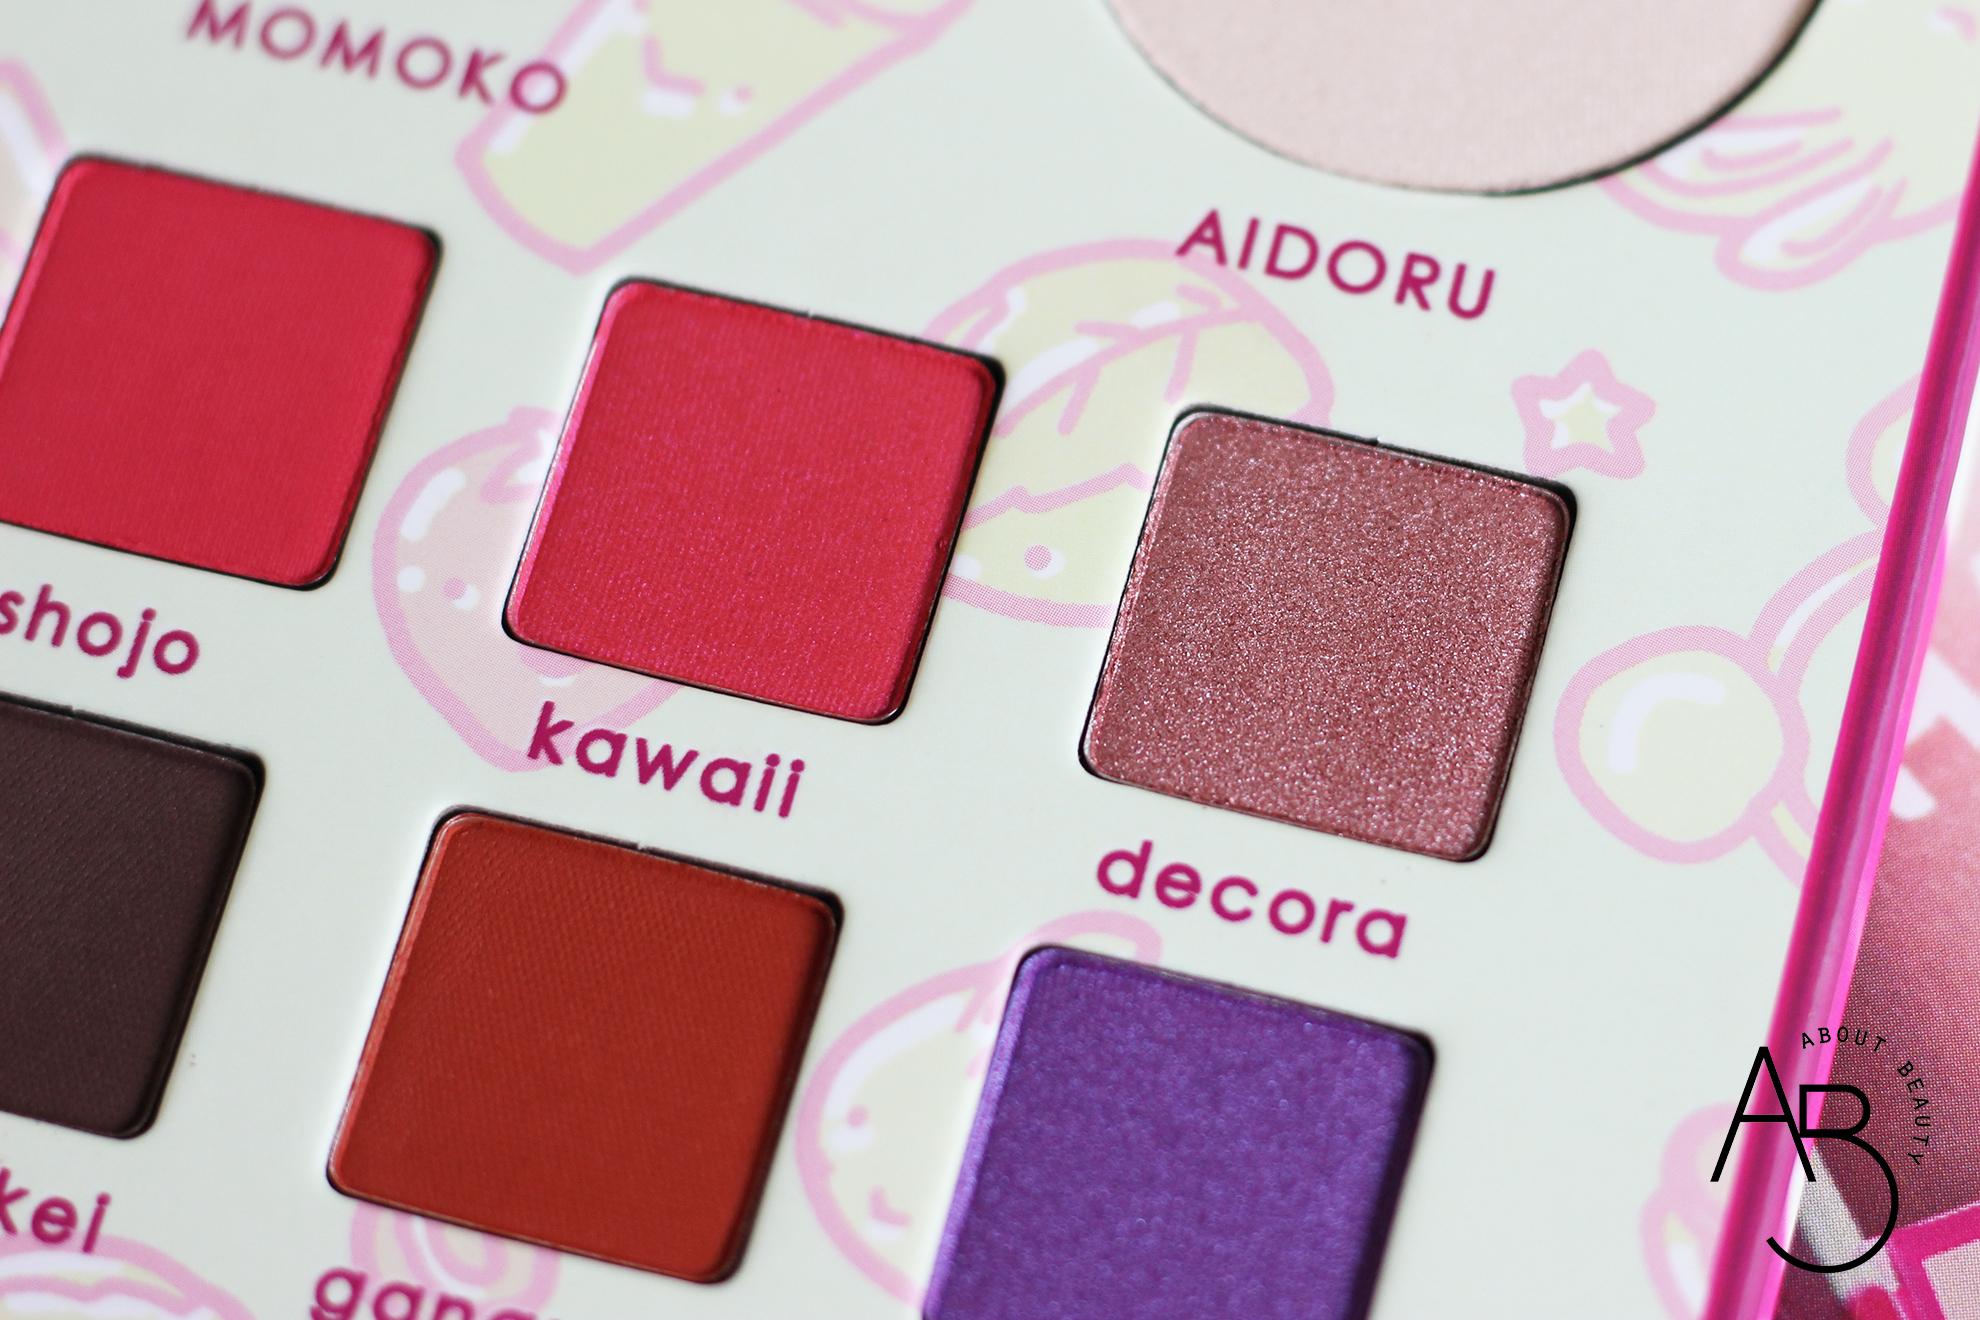 neve cosmetics harajuku memoir palette ombretti eyeshadow - info recensione swatch inci opinioni review tutorial codice sconto - decora